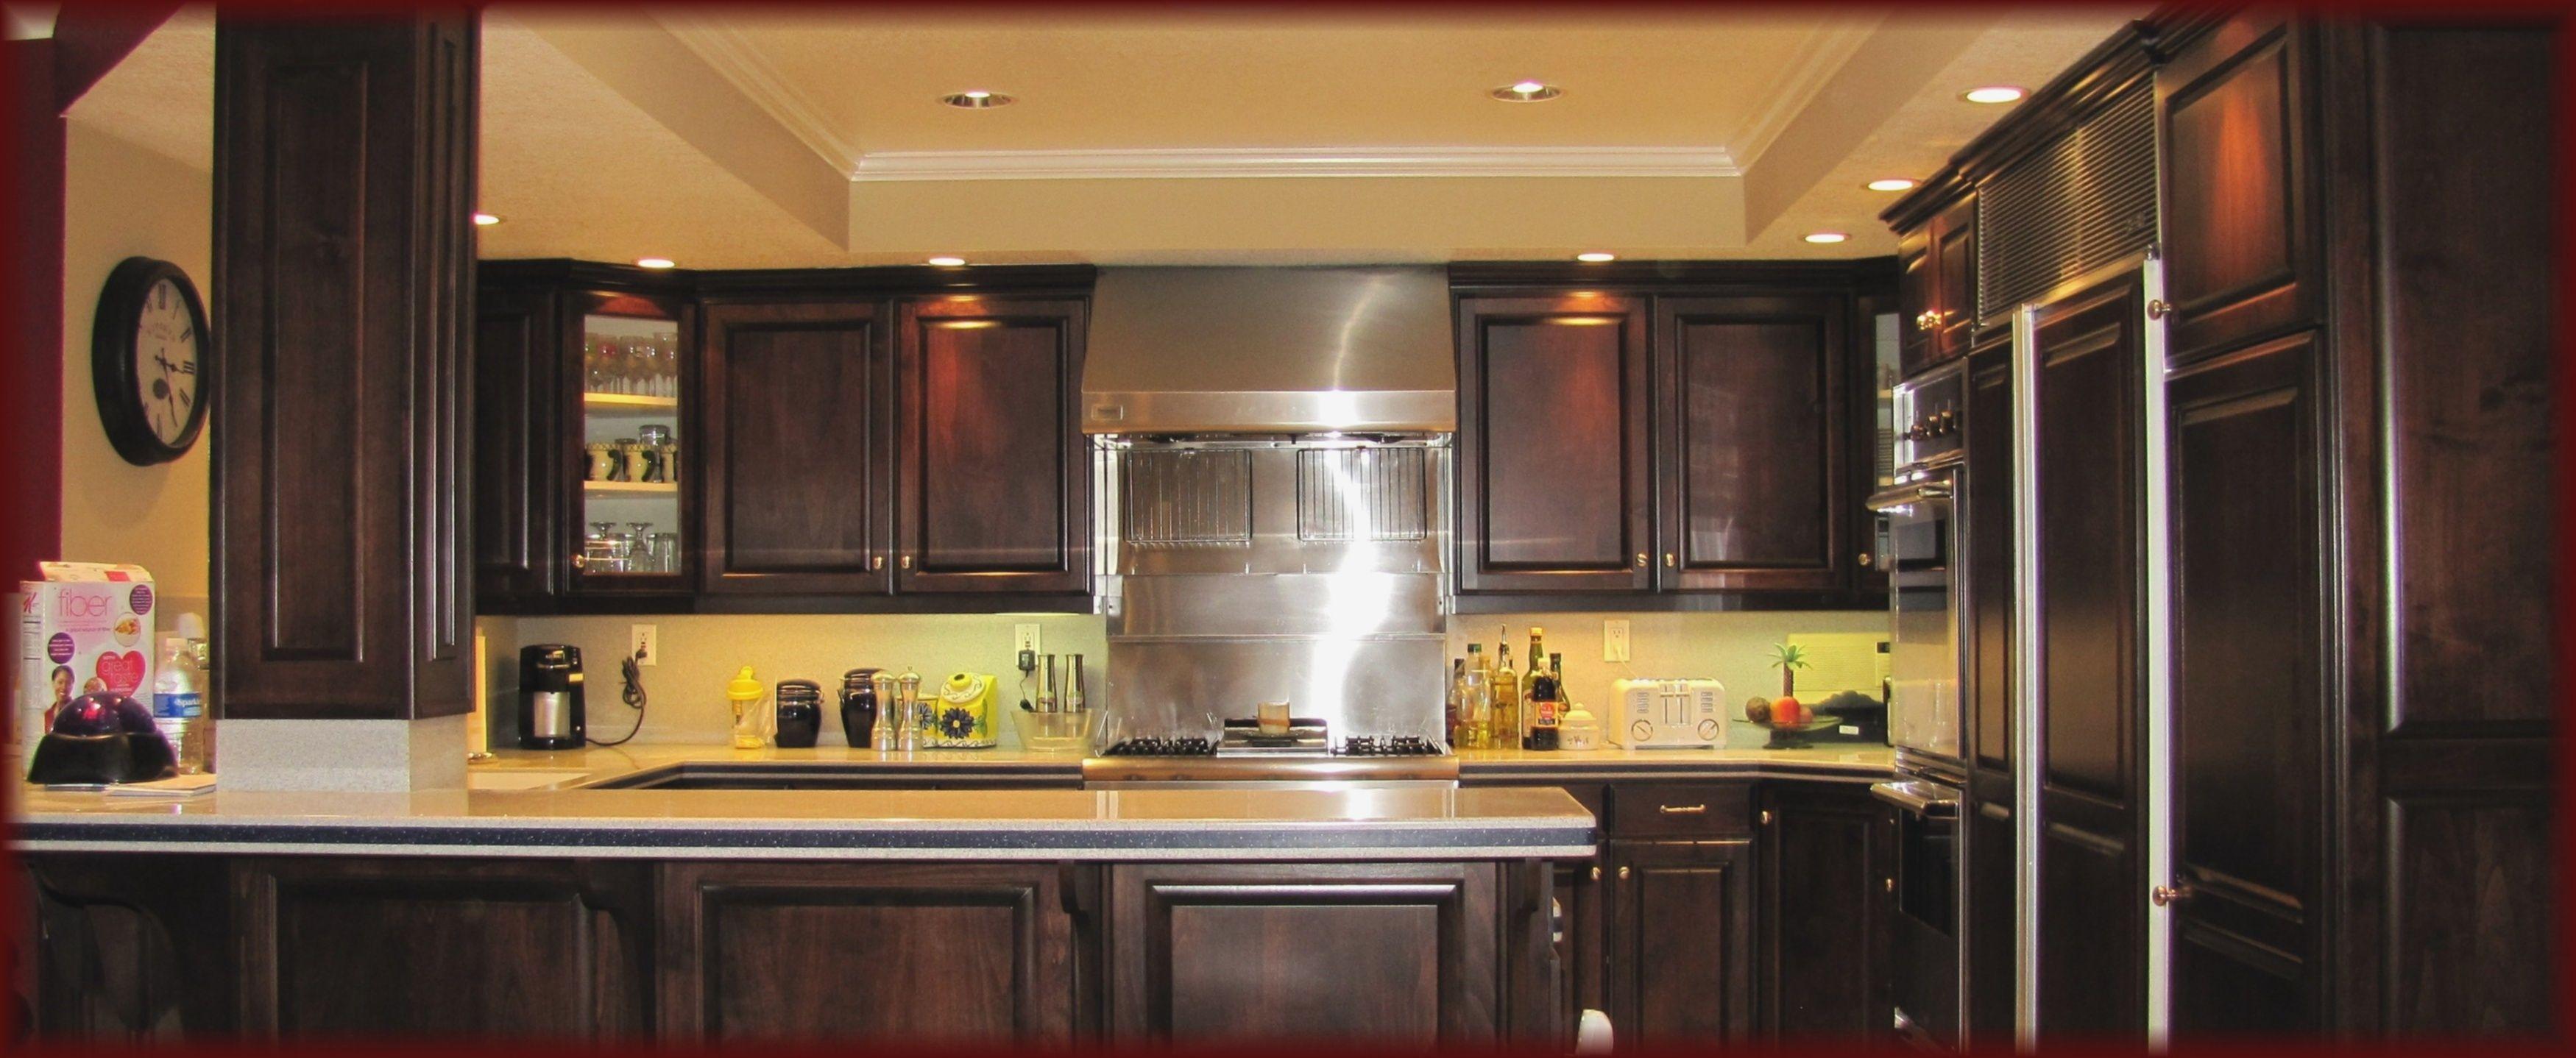 Peak auction kitchen cabinets garecscleaningsystems